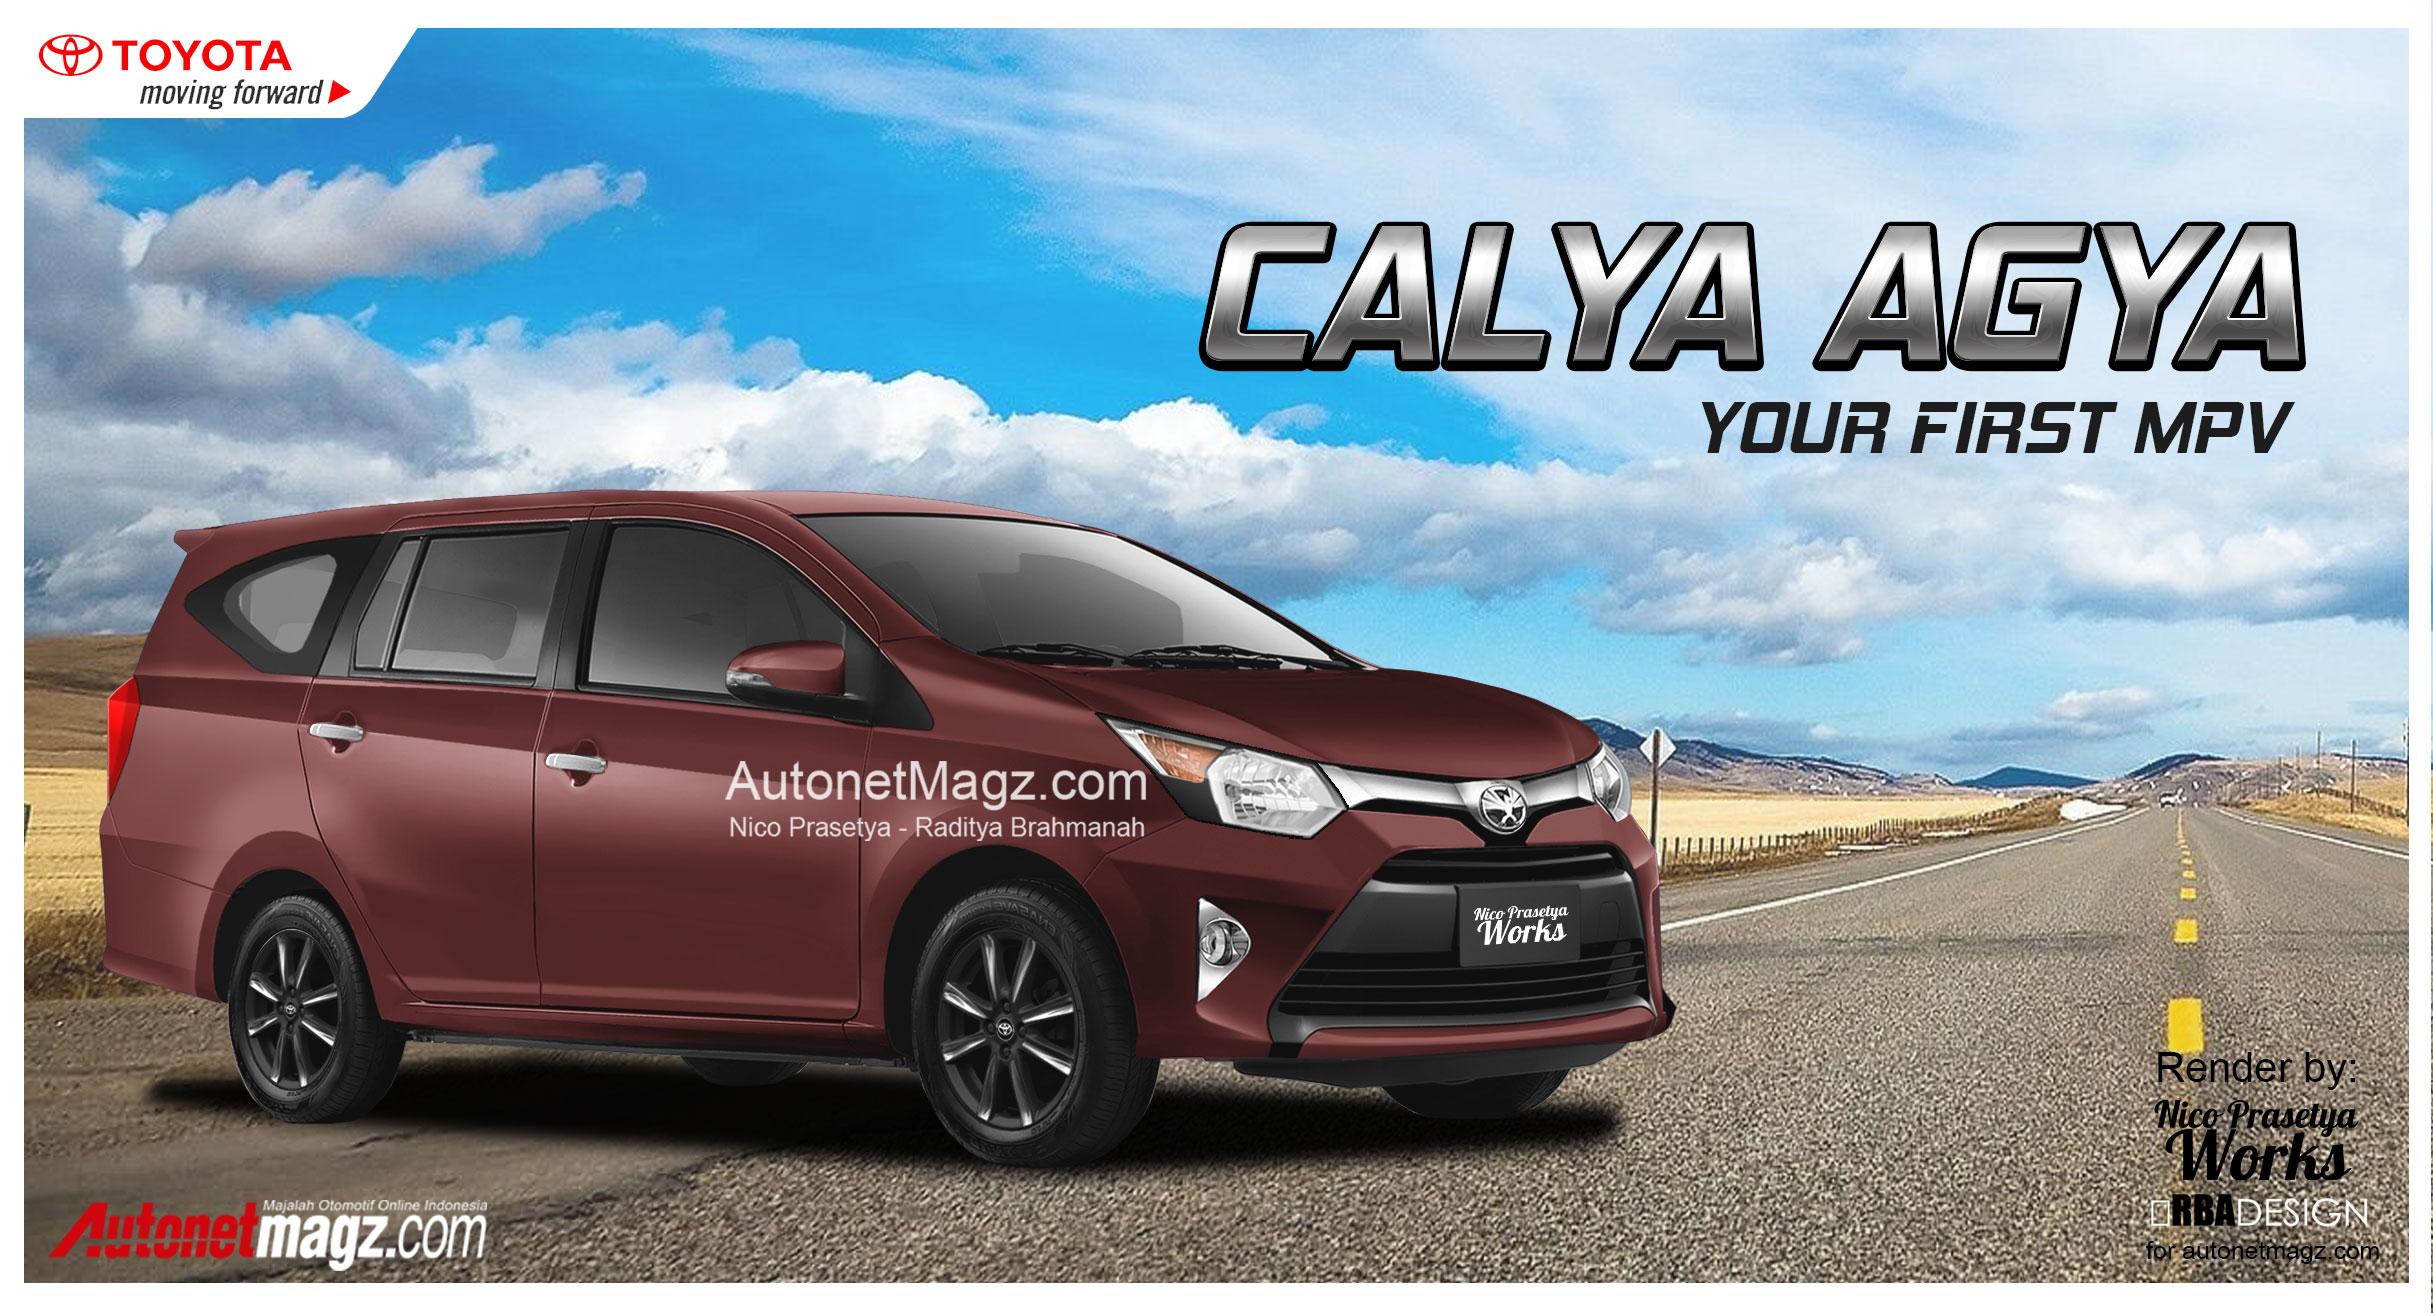 Ini Wujud Toyota Calya Agya 7 Seater Pembunuh Datsun GO